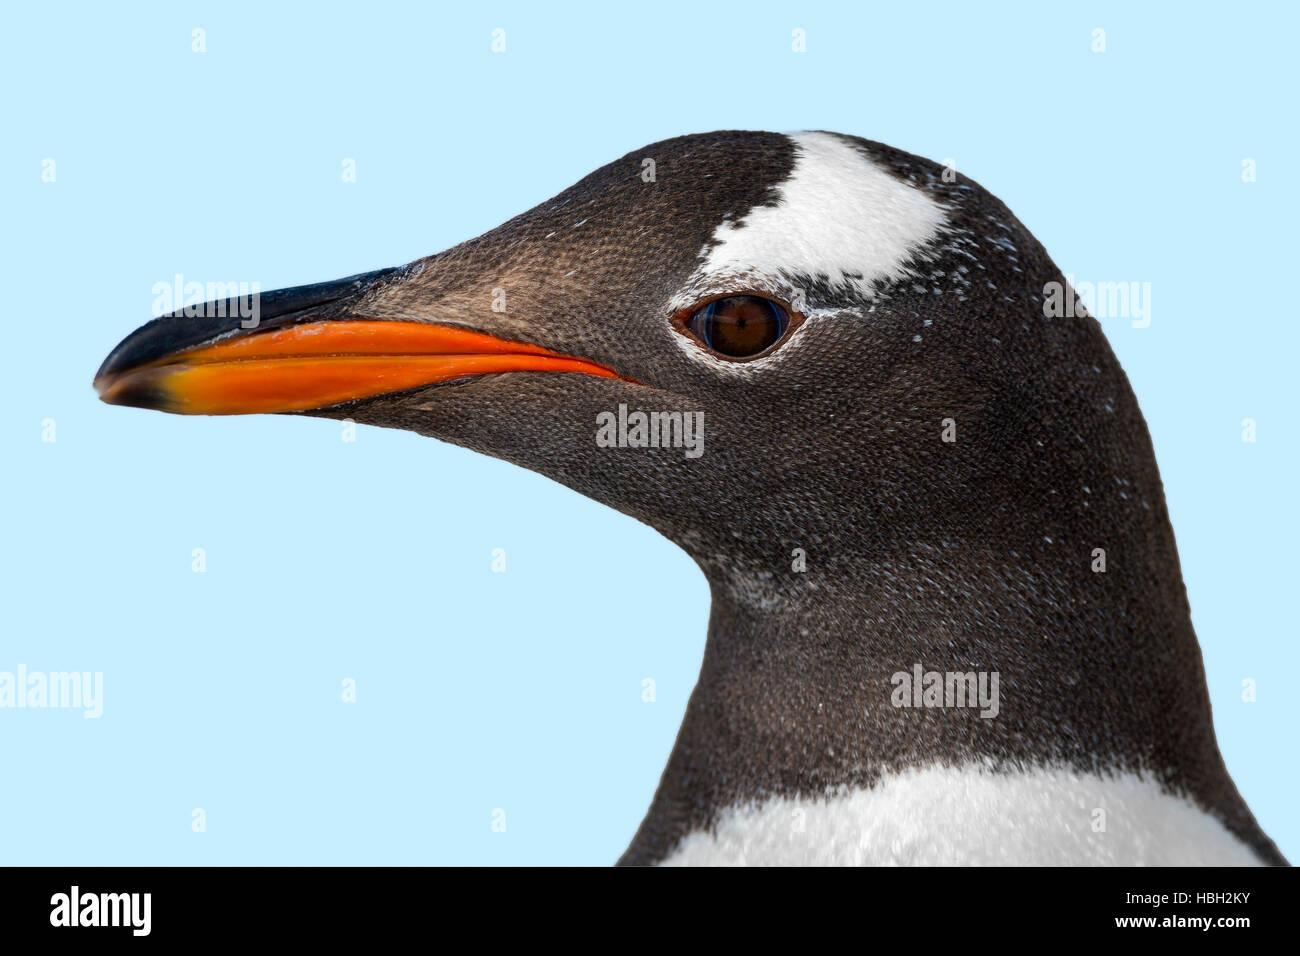 Gentoo Penguin (Pygoscelis papua) portrait - Stock Image